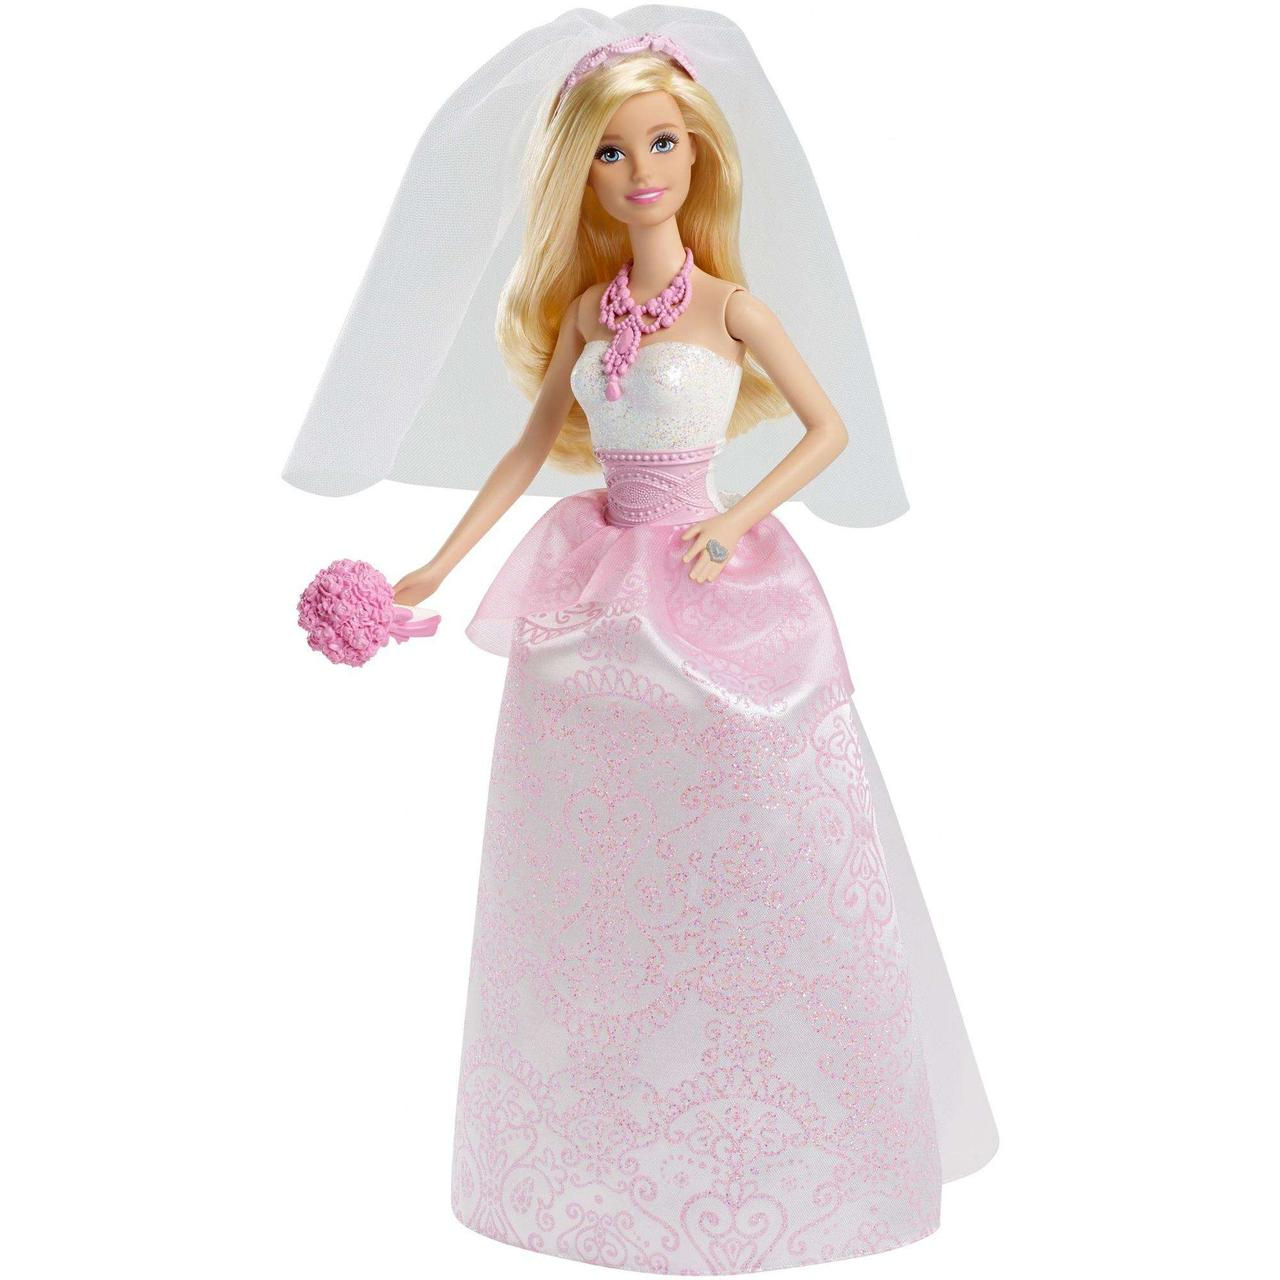 Кукла Барби Сказочная невеста Barbie Fairytale Bride Doll CFF37